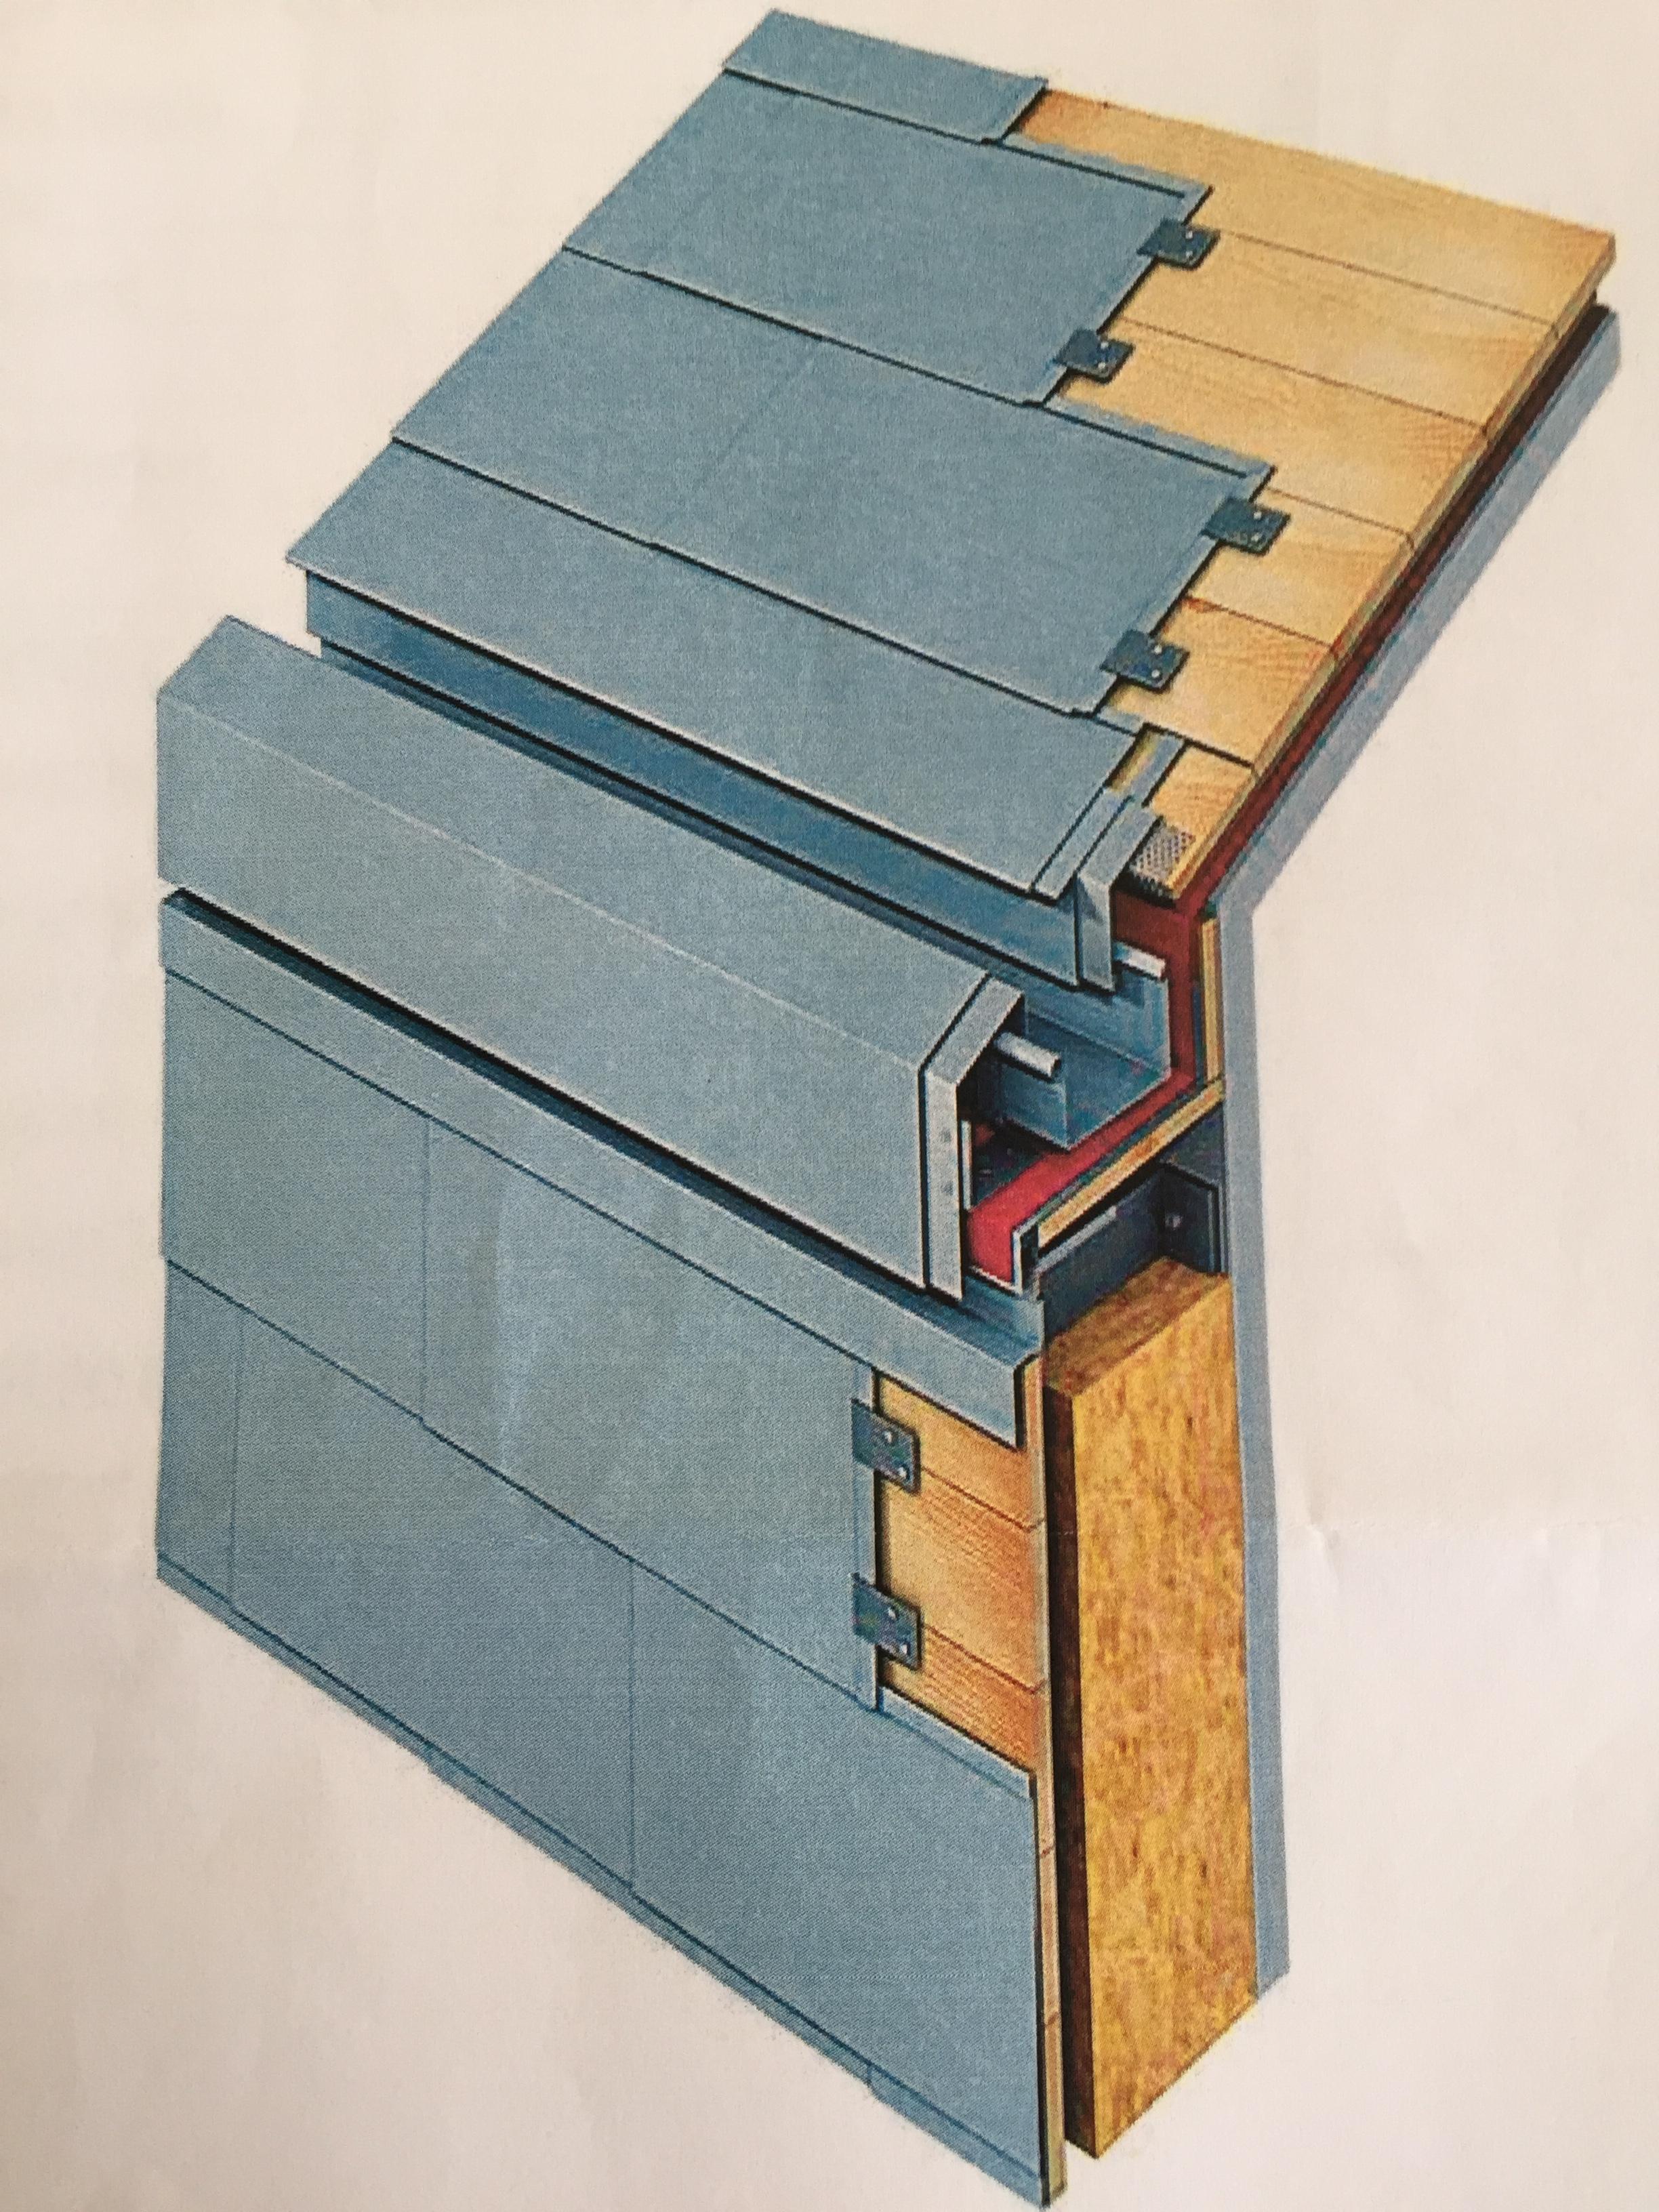 Flat Roof Hidden Gutter Google Trsene House Cladding Roof Architecture Roof Cladding